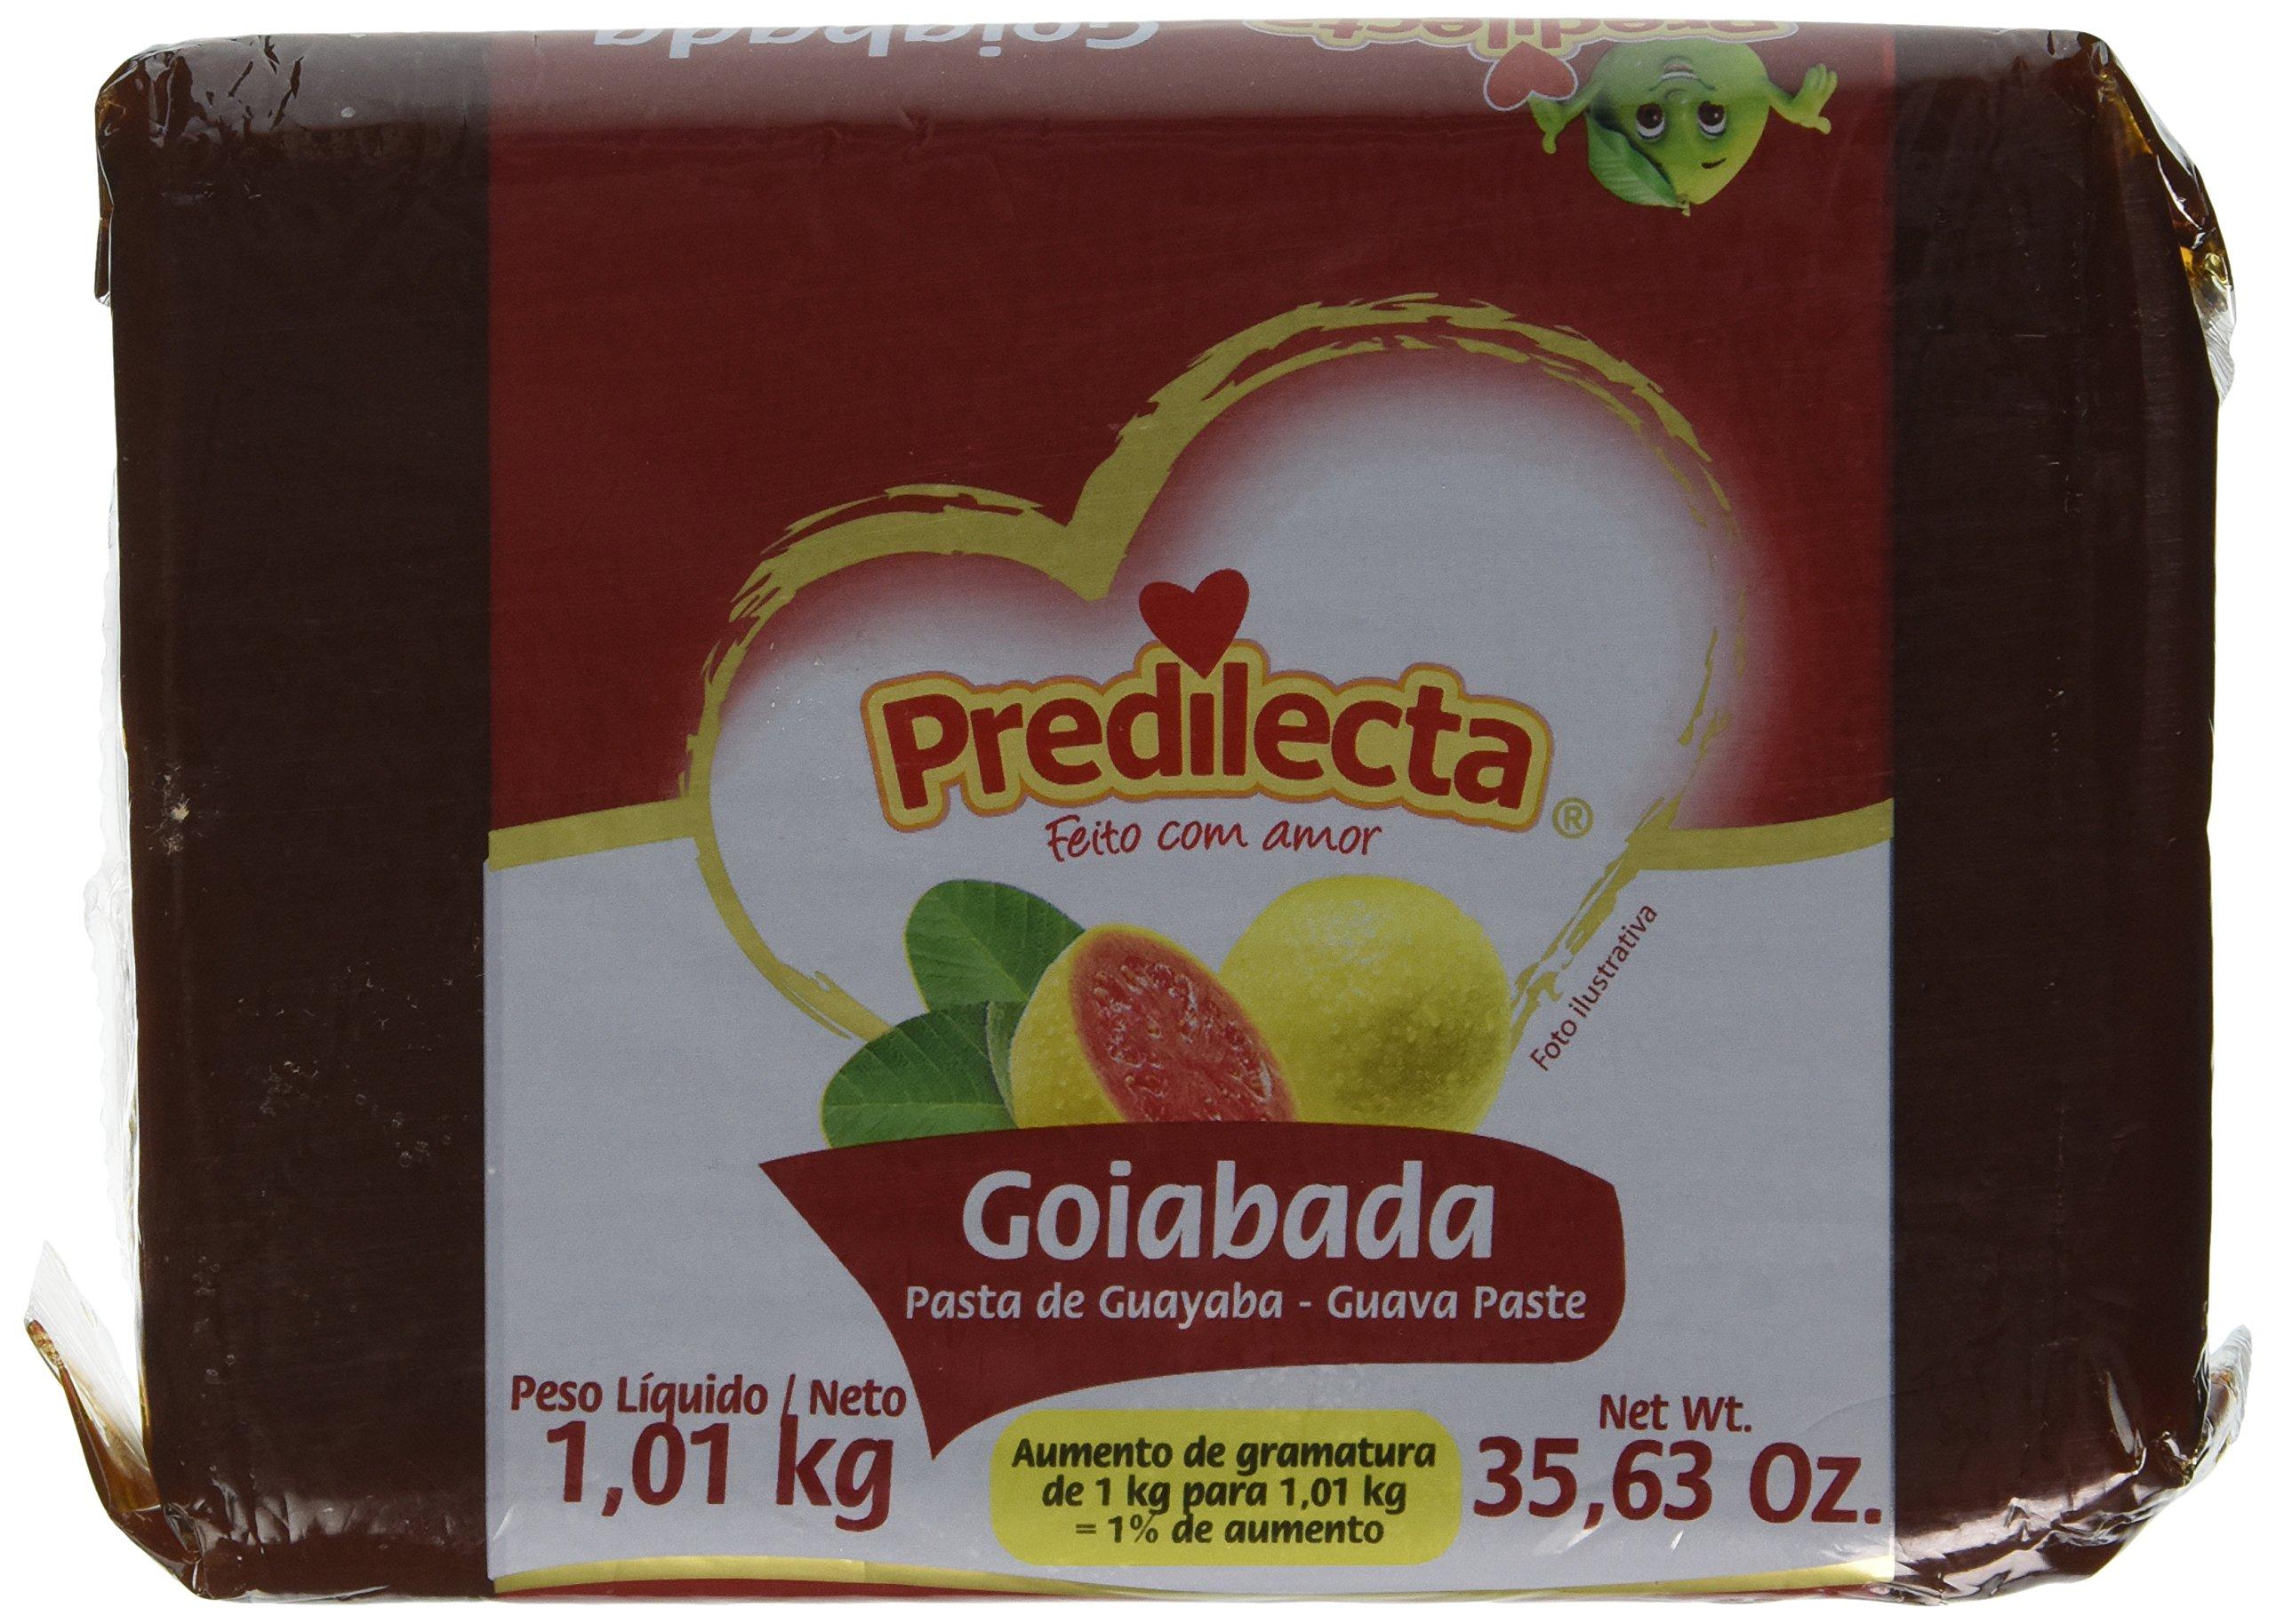 Predilecta Guava Paste - 35.27oz | Goiabada Predilecta - 1kg - (PACK OF 02)